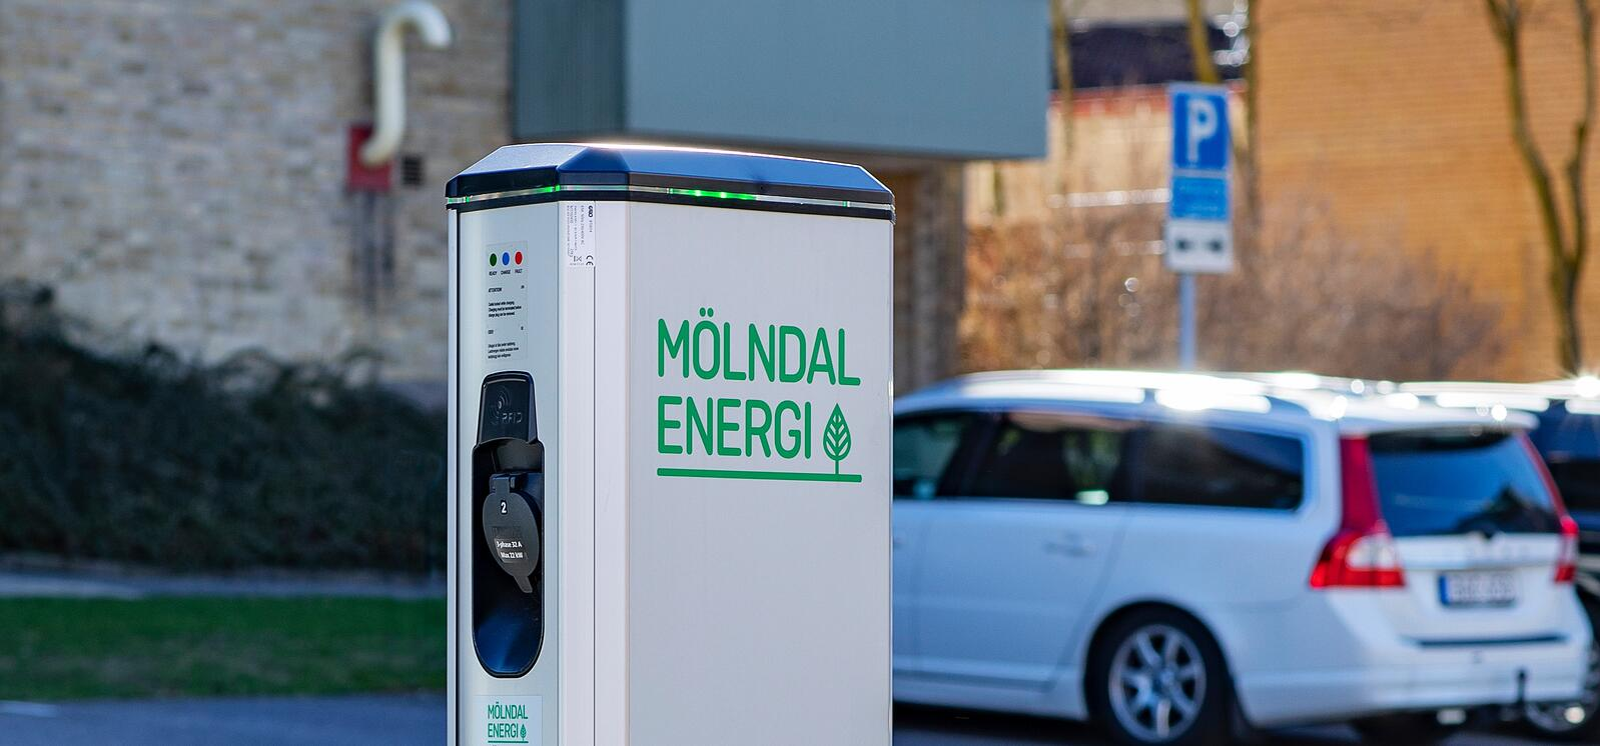 Laddstolpe_Laddinfrastruktur_Molndal Energi-1